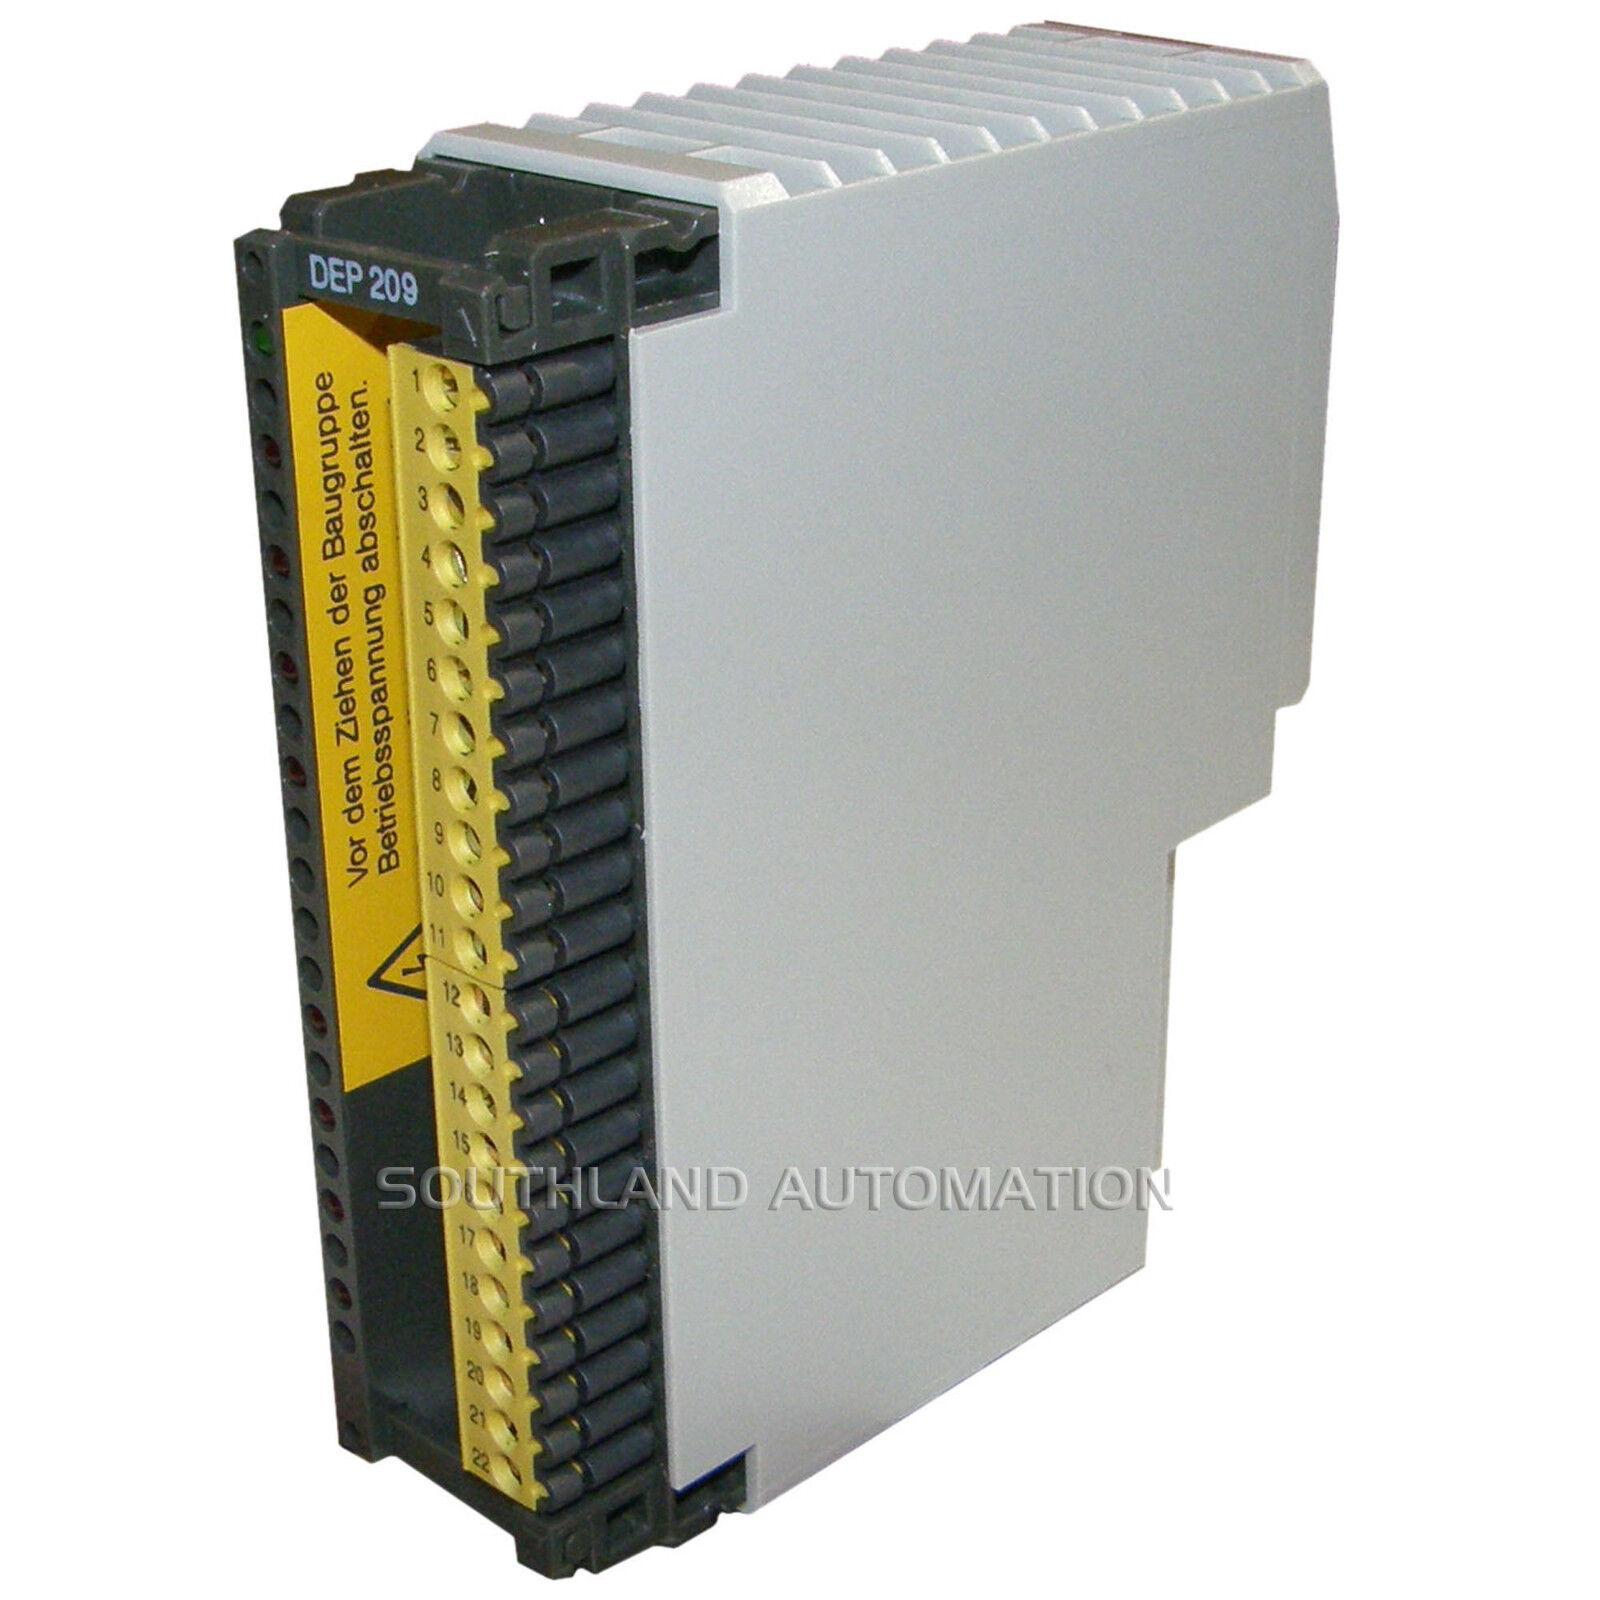 MODICON AS-BDEP-209 115 V AC INPUT MODULE 8 POINT--SA